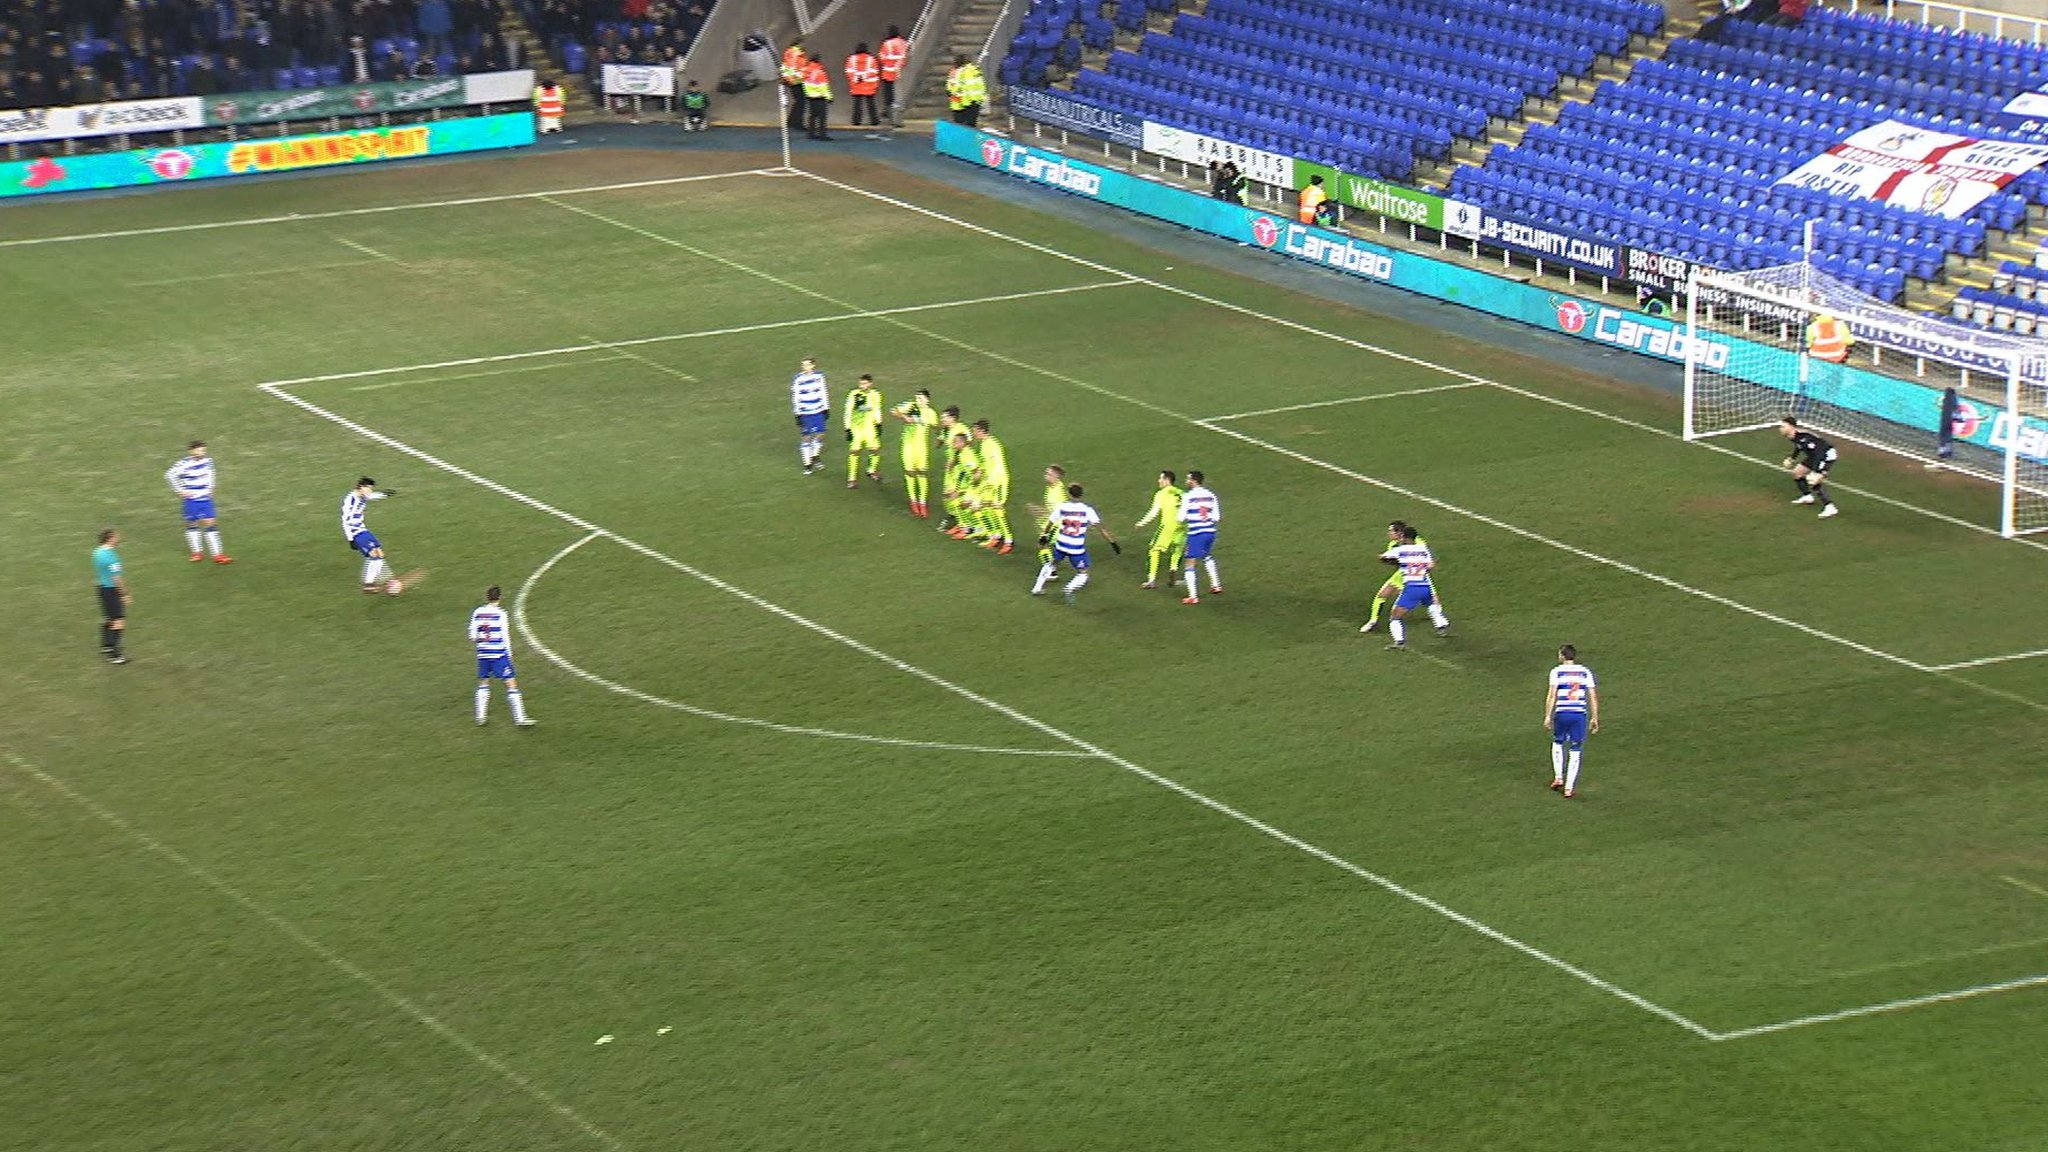 Lucas Piazon scores a free-kick for Reading